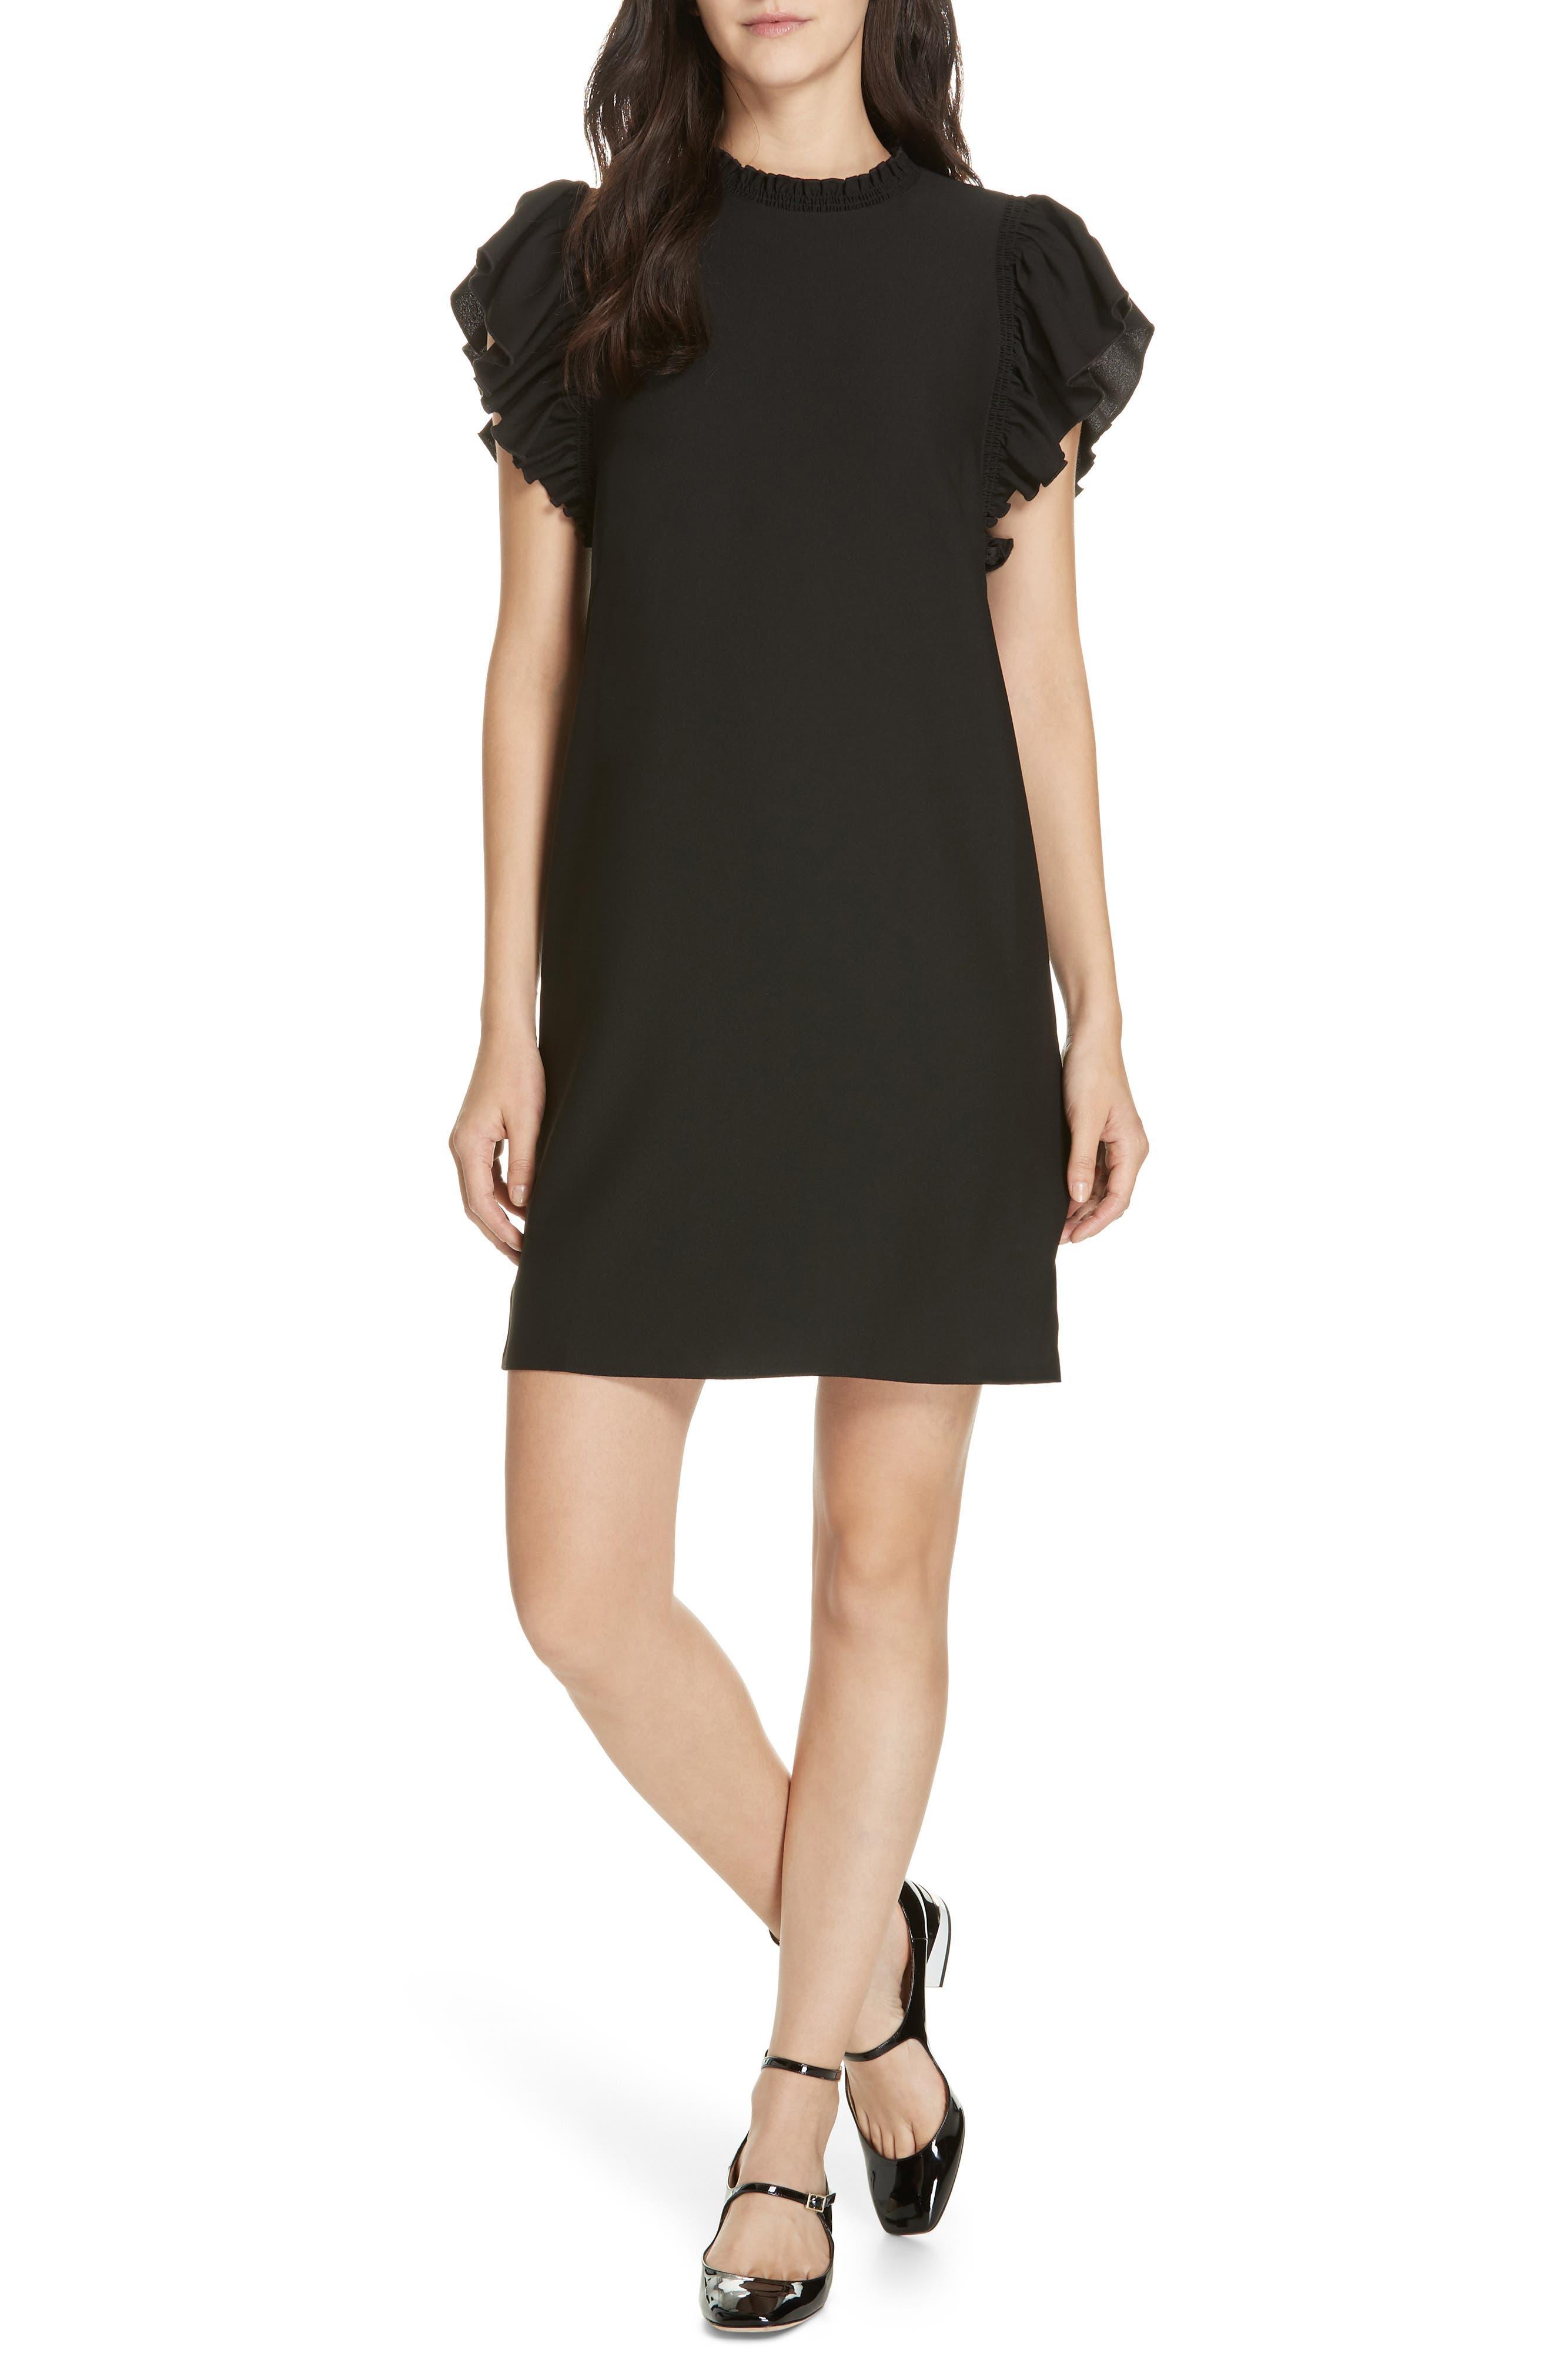 Kate Spade New York Ruffle Crepe Shift Dress